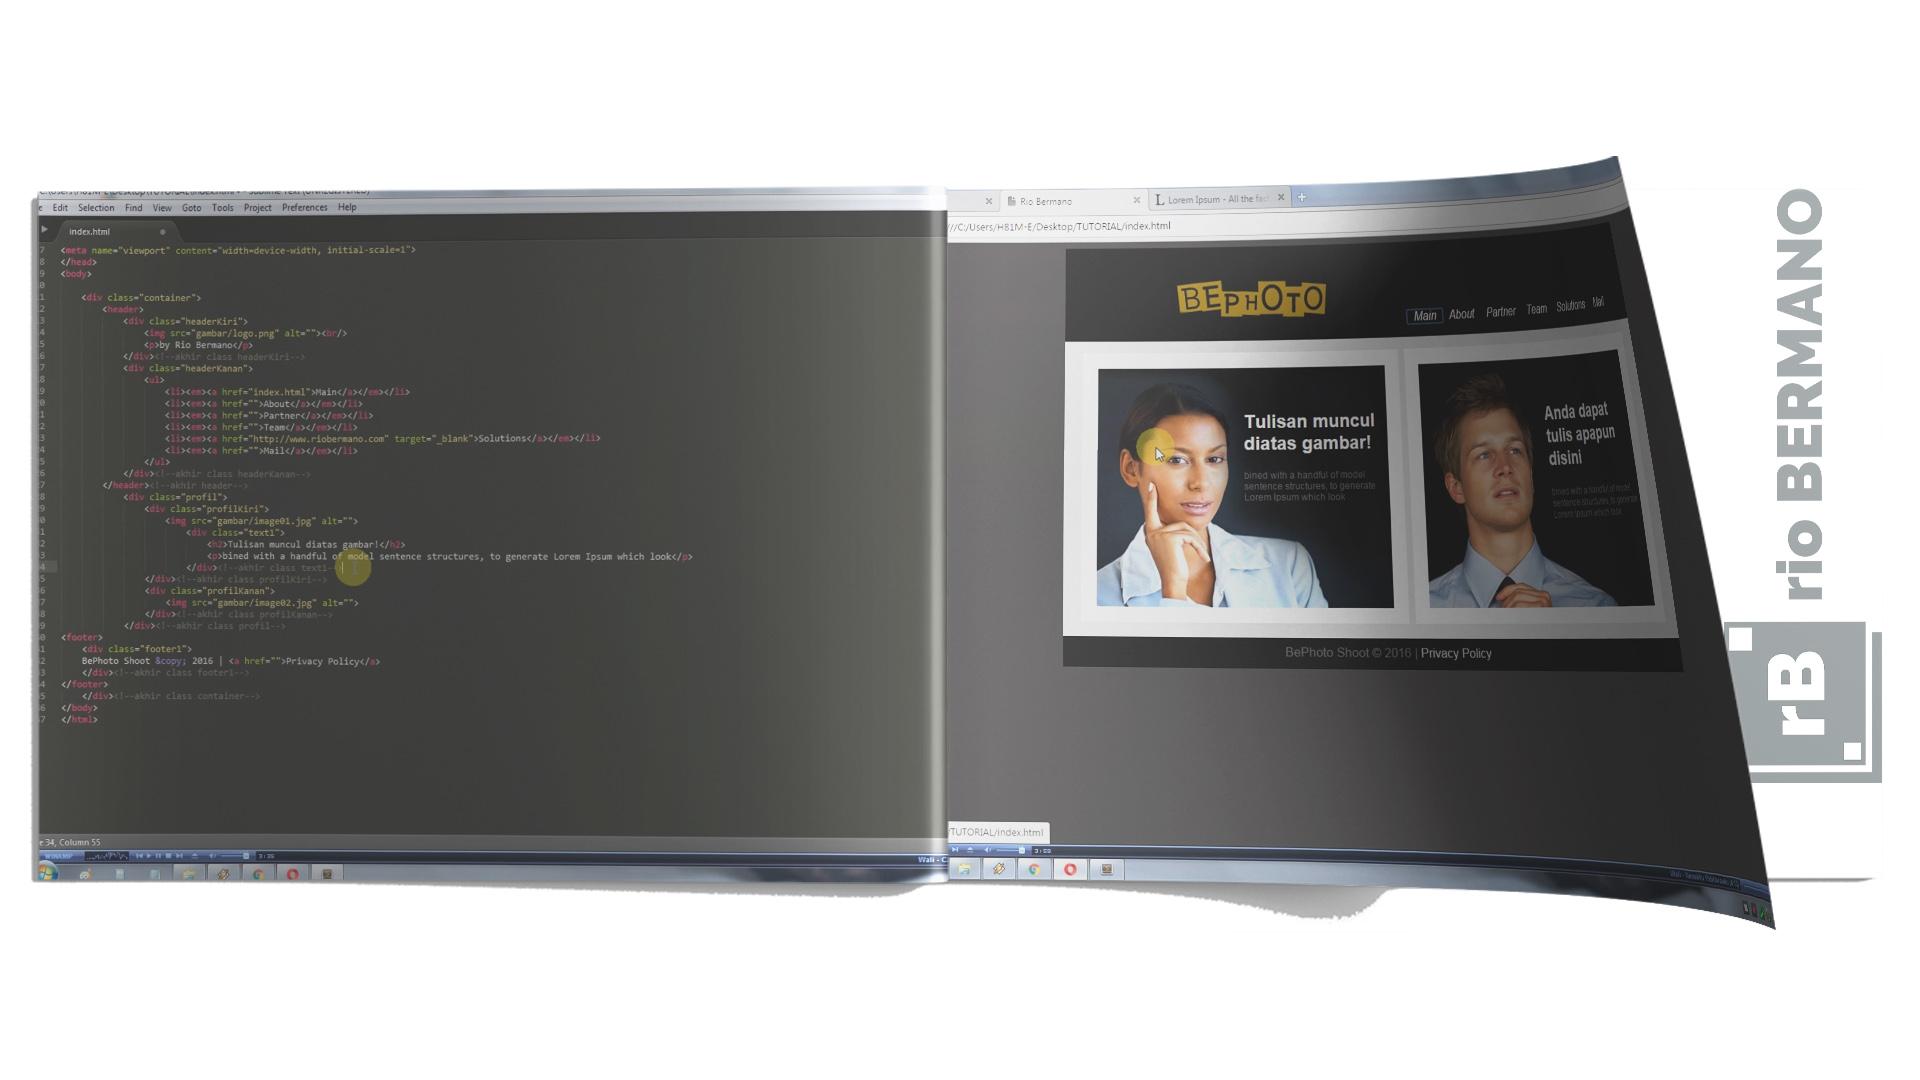 cara membuat text menimpa gambar html css - rio bermano